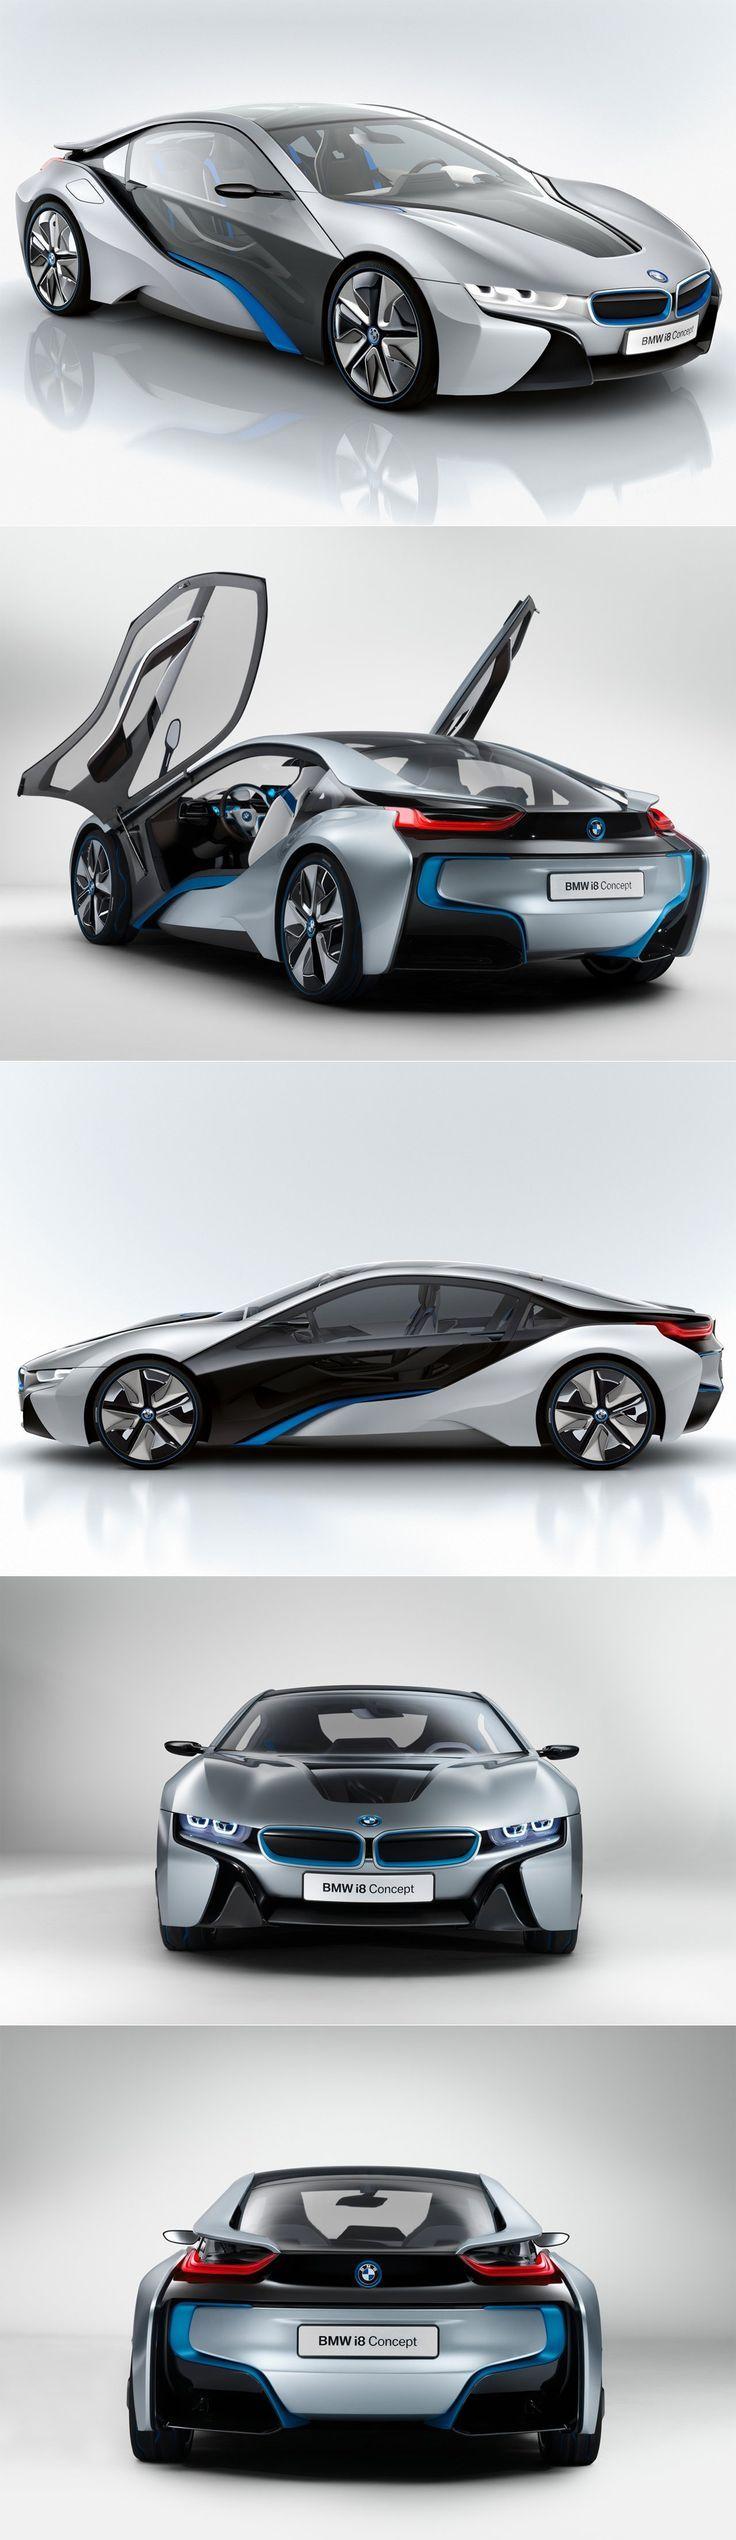 Nice BMW 2017: 볼만은 한데, 뭔가 허전... 미션 임파서블 : 고스트 프로토콜 ★★★☆☆ Car24 - World Bayers Check more at http://car24.top/2017/2017/04/10/bmw-2017-%eb%b3%bc%eb%a7%8c%ec%9d%80-%ed%95%9c%eb%8d%b0-%eb%ad%94%ea%b0%80-%ed%97%88%ec%a0%84-%eb%af%b8%ec%85%98-%ec%9e%84%ed%8c%8c%ec%84%9c%eb%b8%94-%ea%b3%a0%ec%8a%a4%ed%8a%b8-%ed%94%84-2/